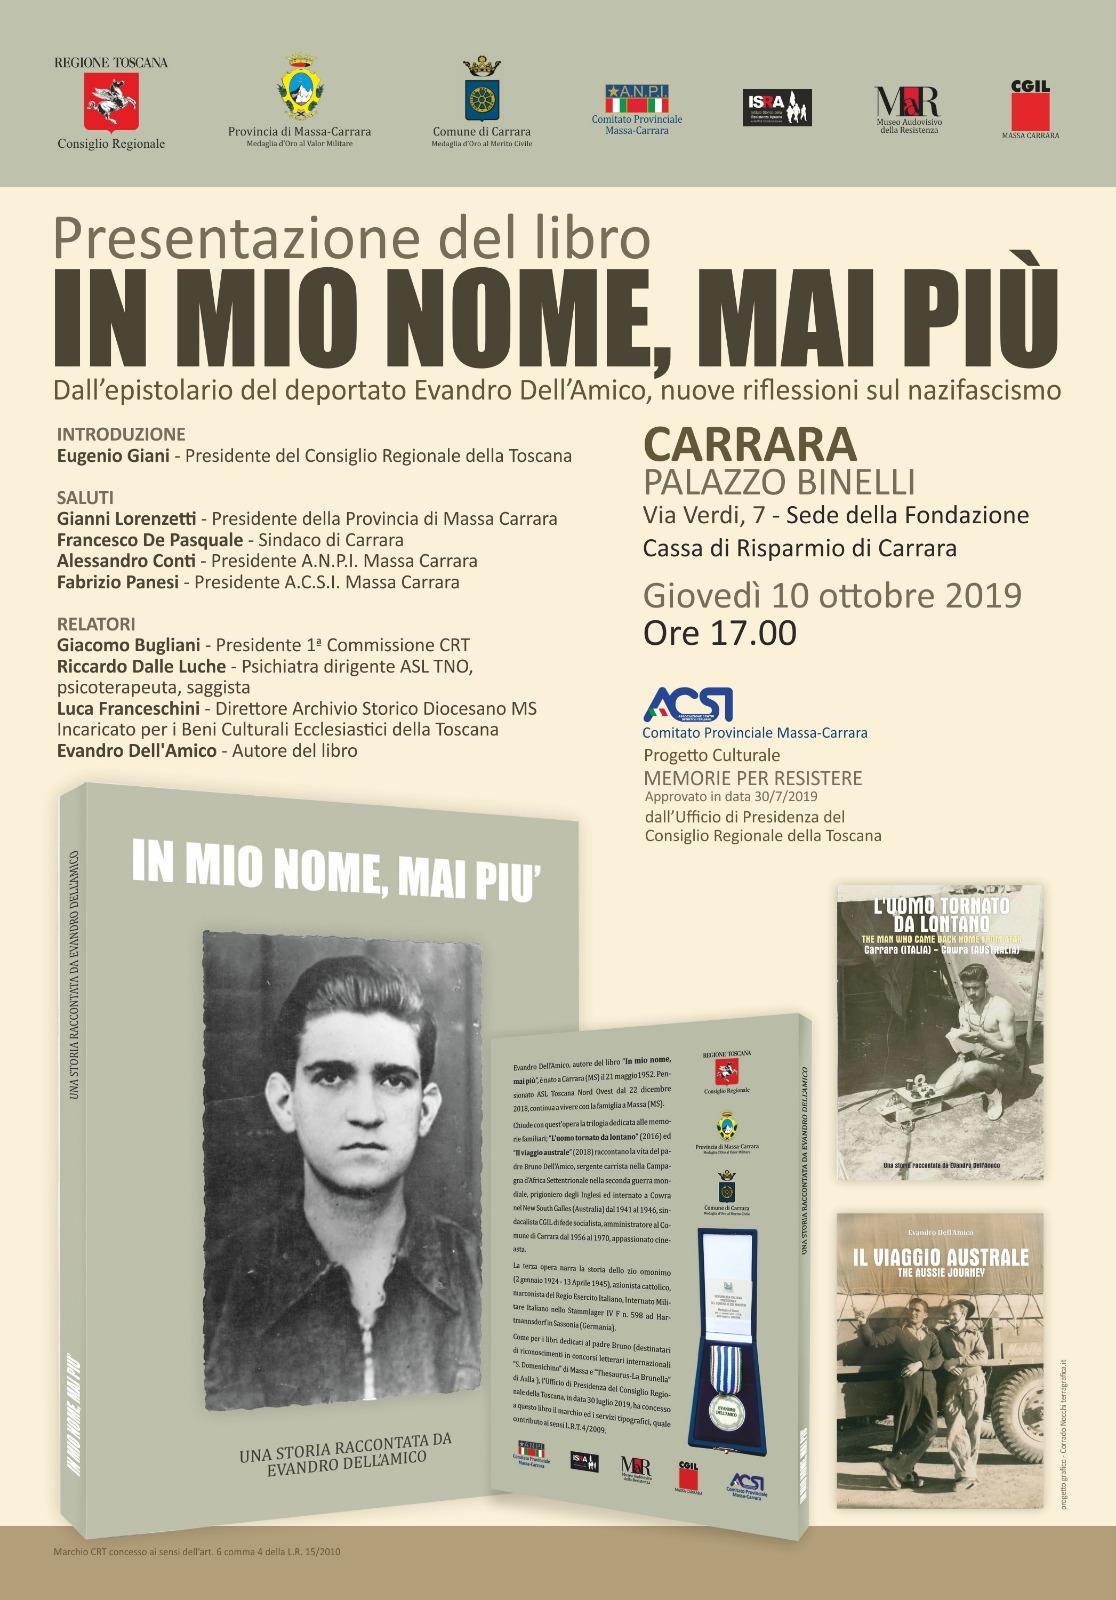 IN MIO NOME, MAI PIU'-Locandina presentazione 10102019